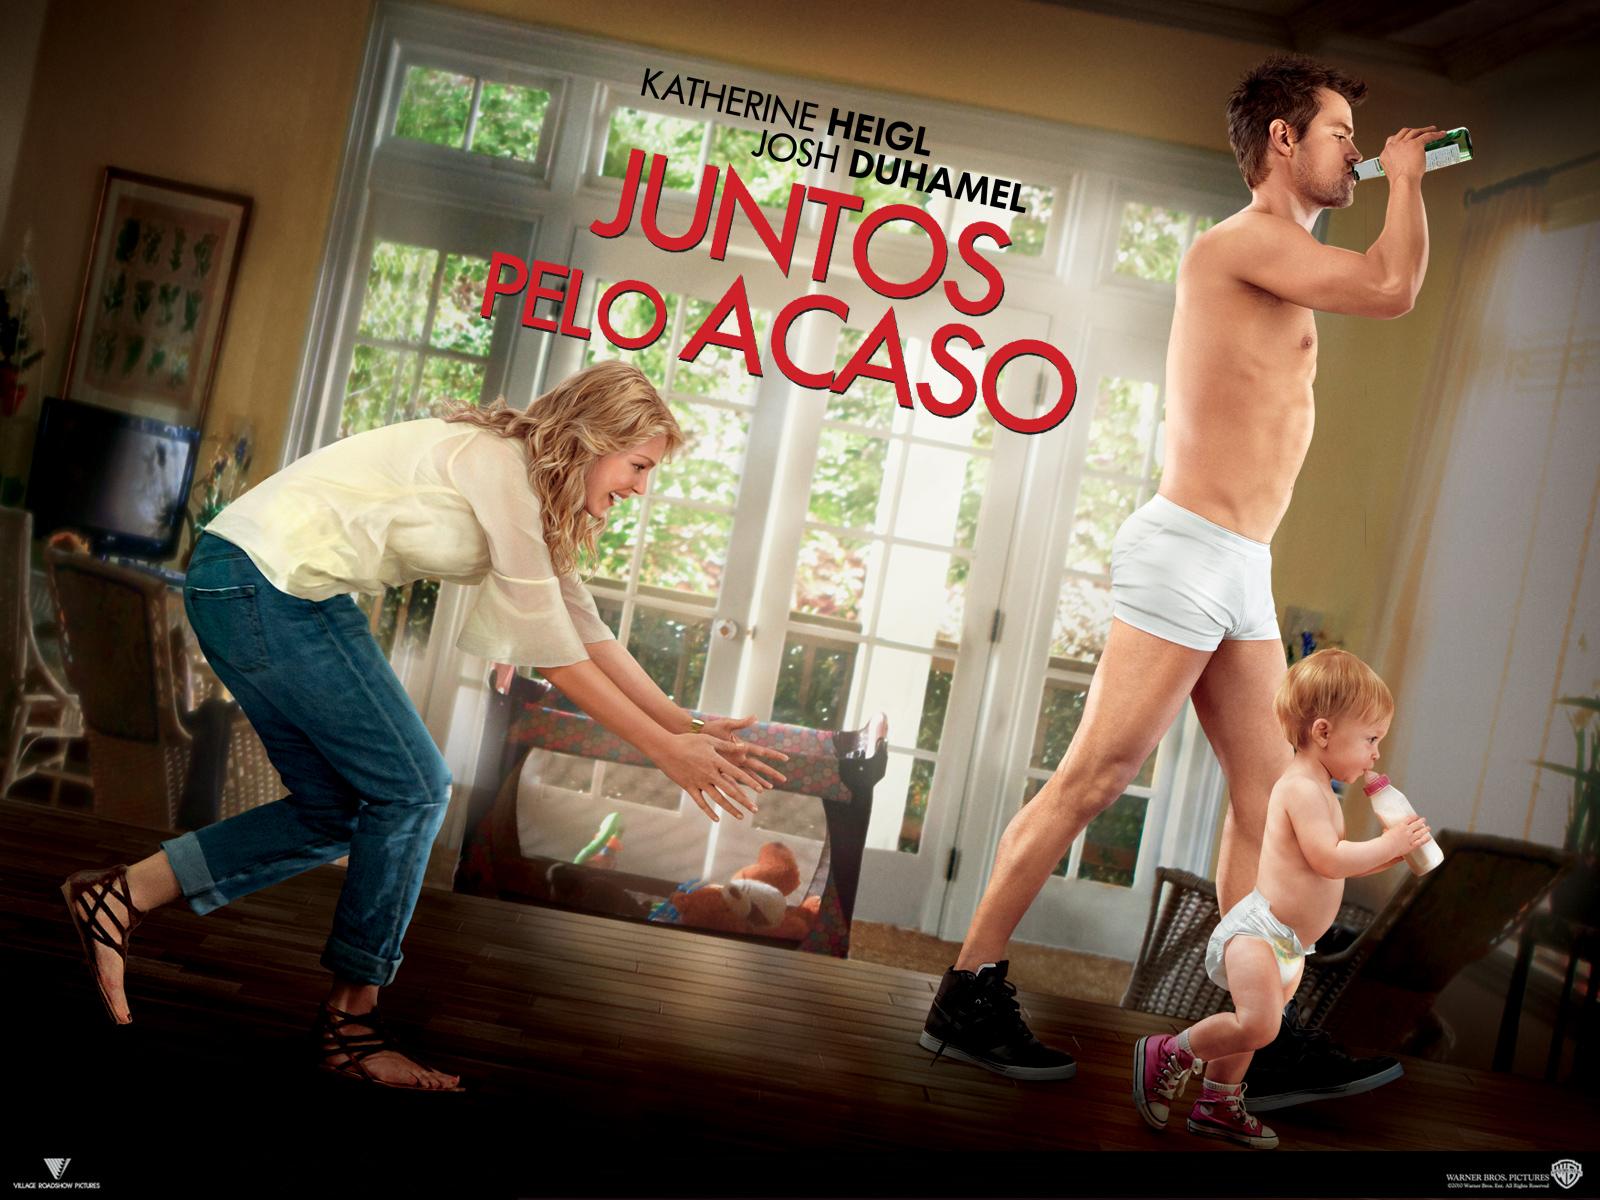 http://3.bp.blogspot.com/-_dU7roFoJFE/UQLPVKmb4-I/AAAAAAAABvs/pDDTjaN7JcY/s1600/juntos_pelo_acaso_1.jpg